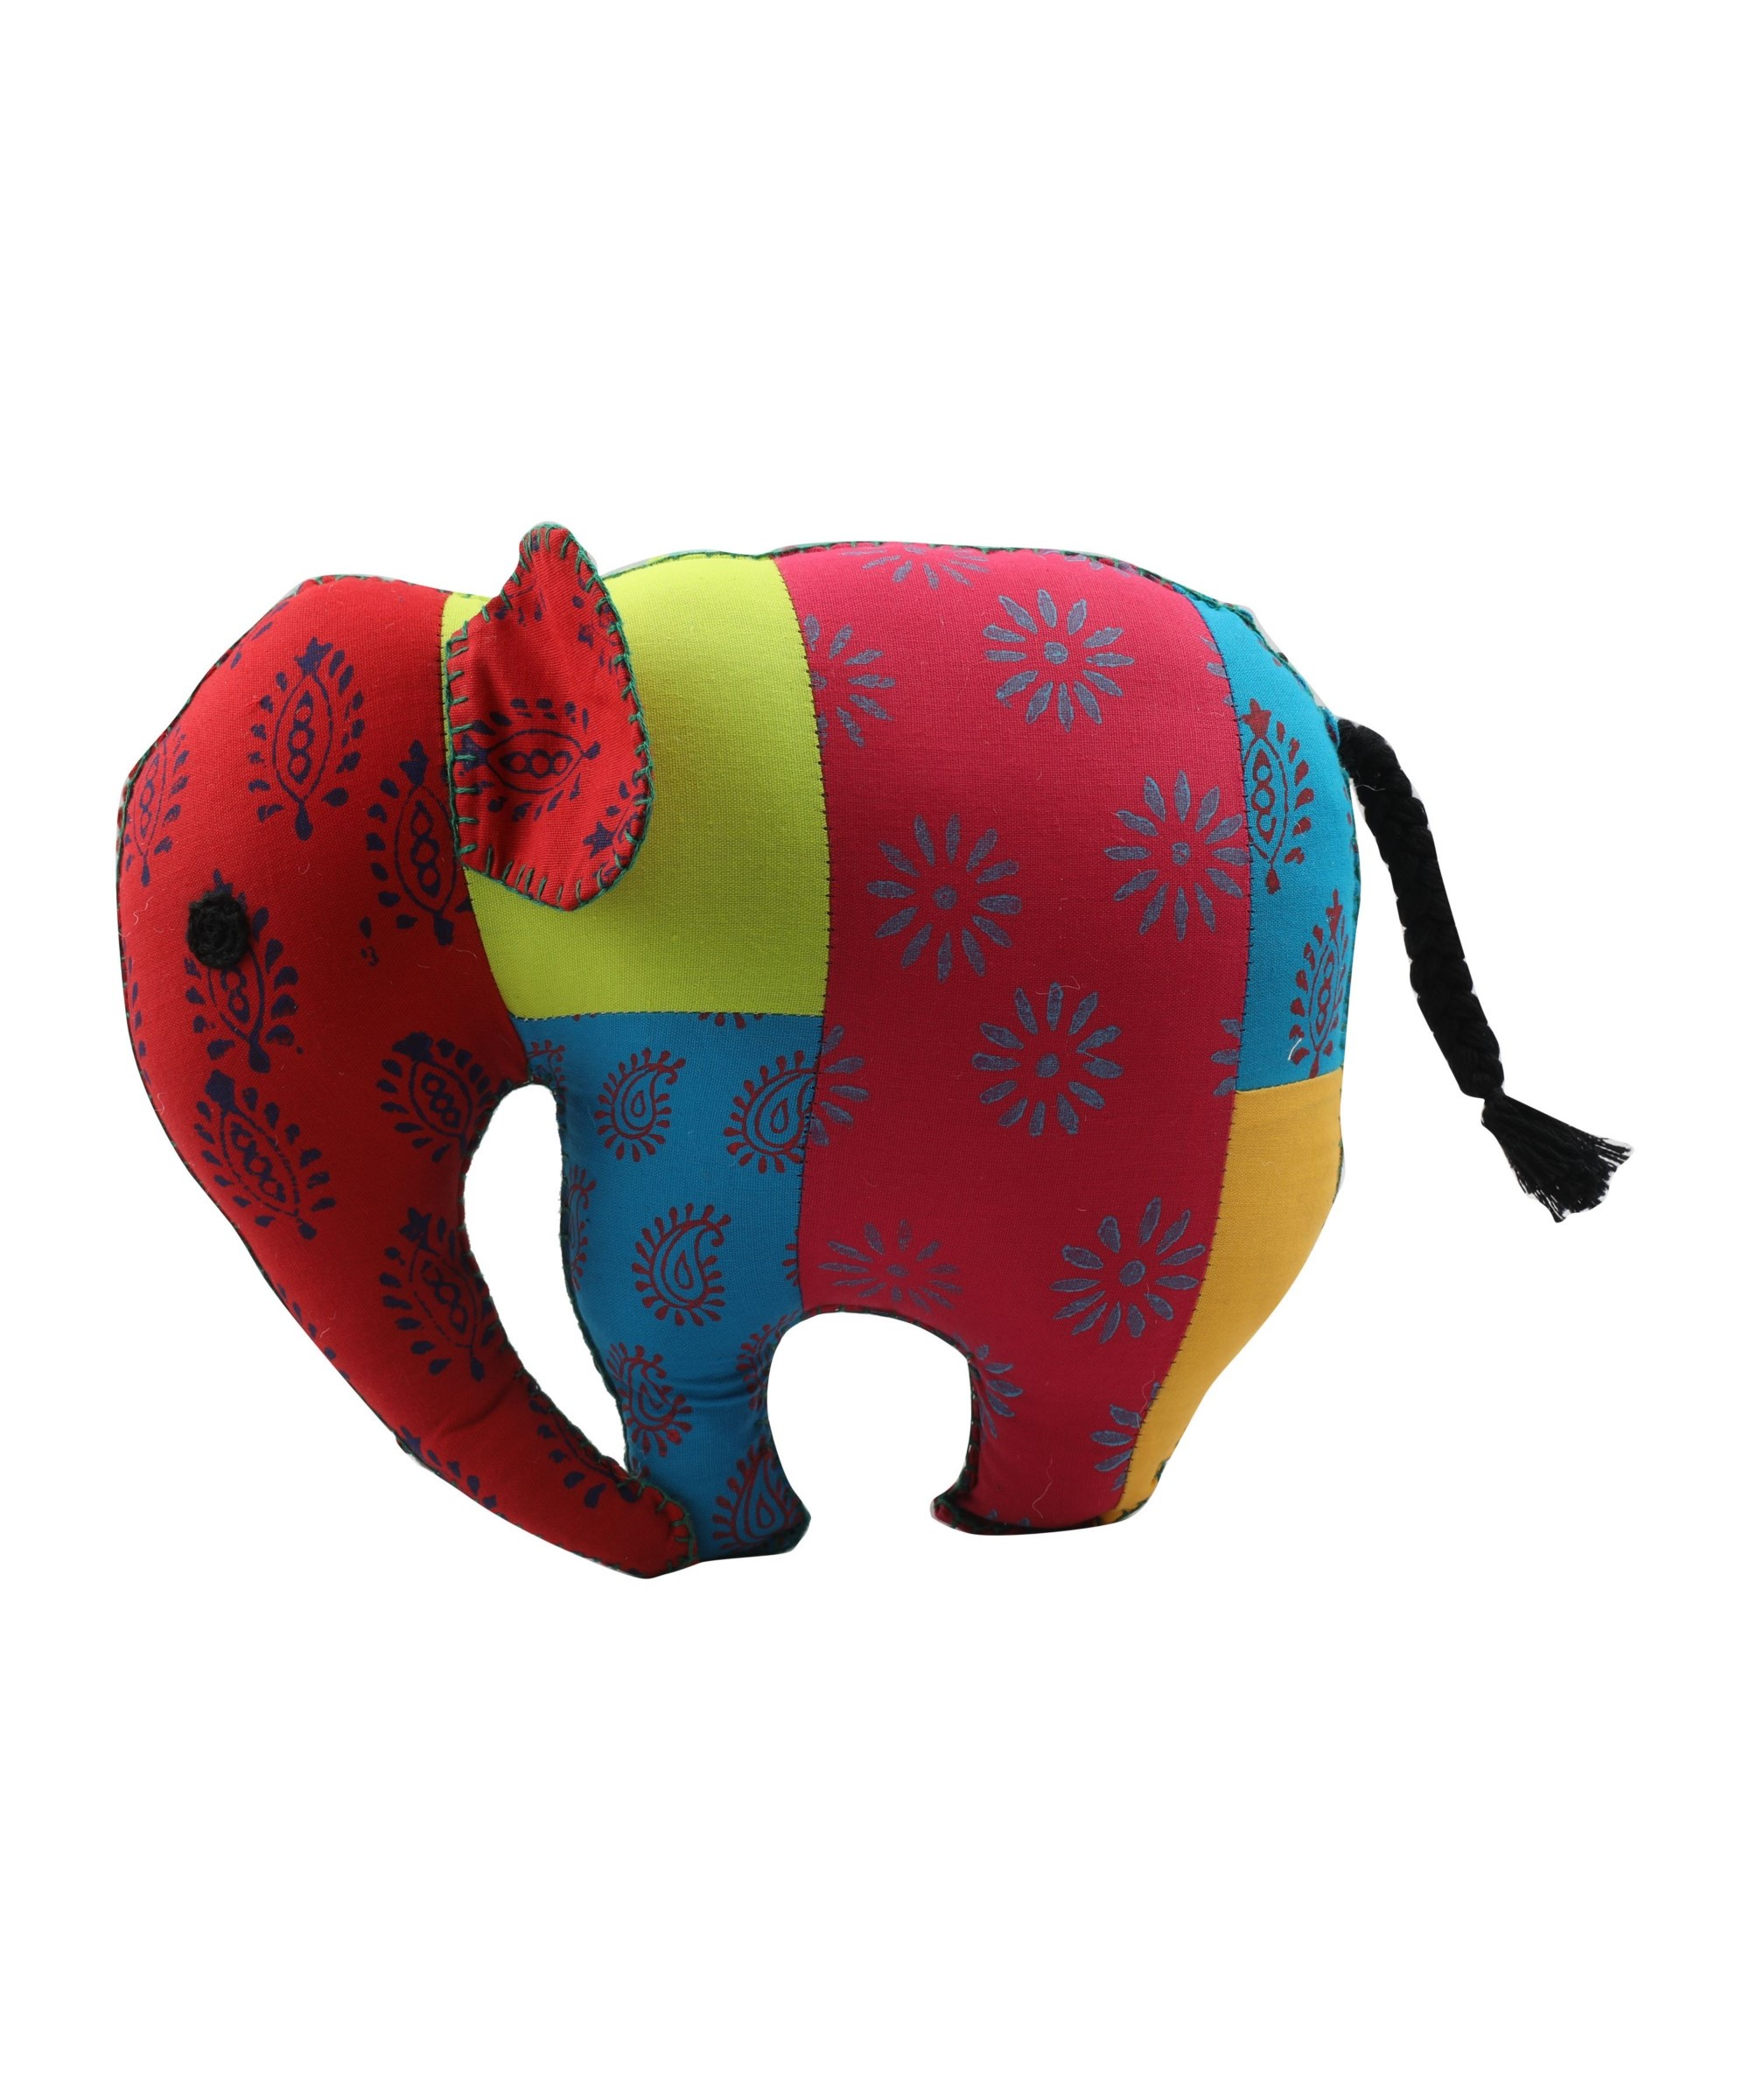 Elephant - Patchwork Soft Toy Slider 4/5